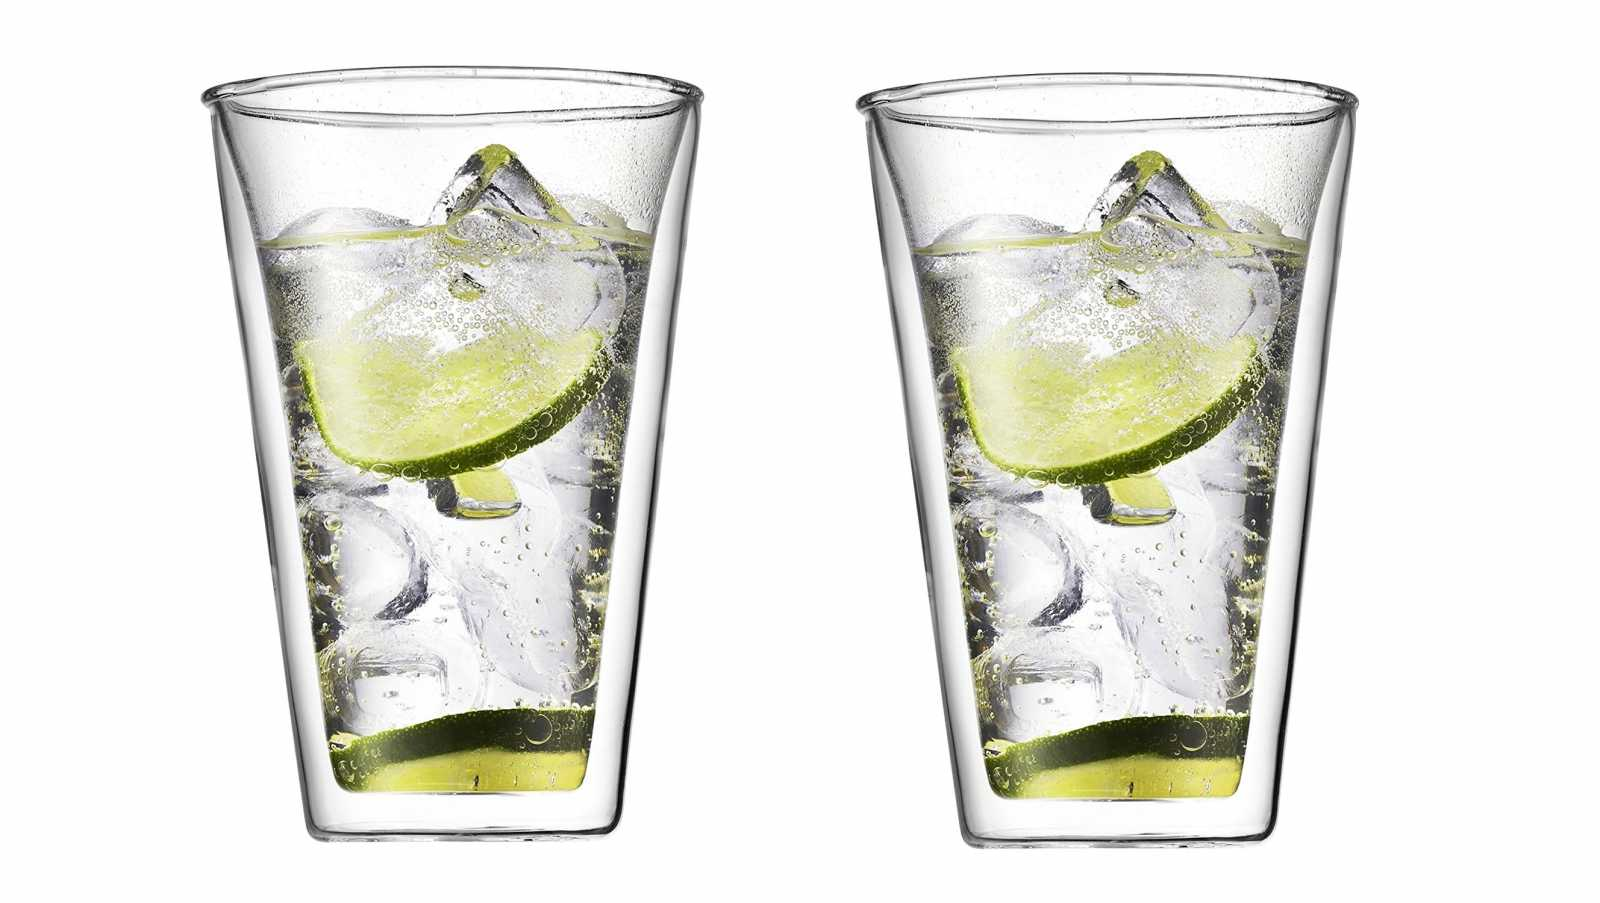 Онлайн каталог PROMENU: Набор стаканов с двойными стенками Bodum, 0,4 л, 2 шт Bodum 10110-10